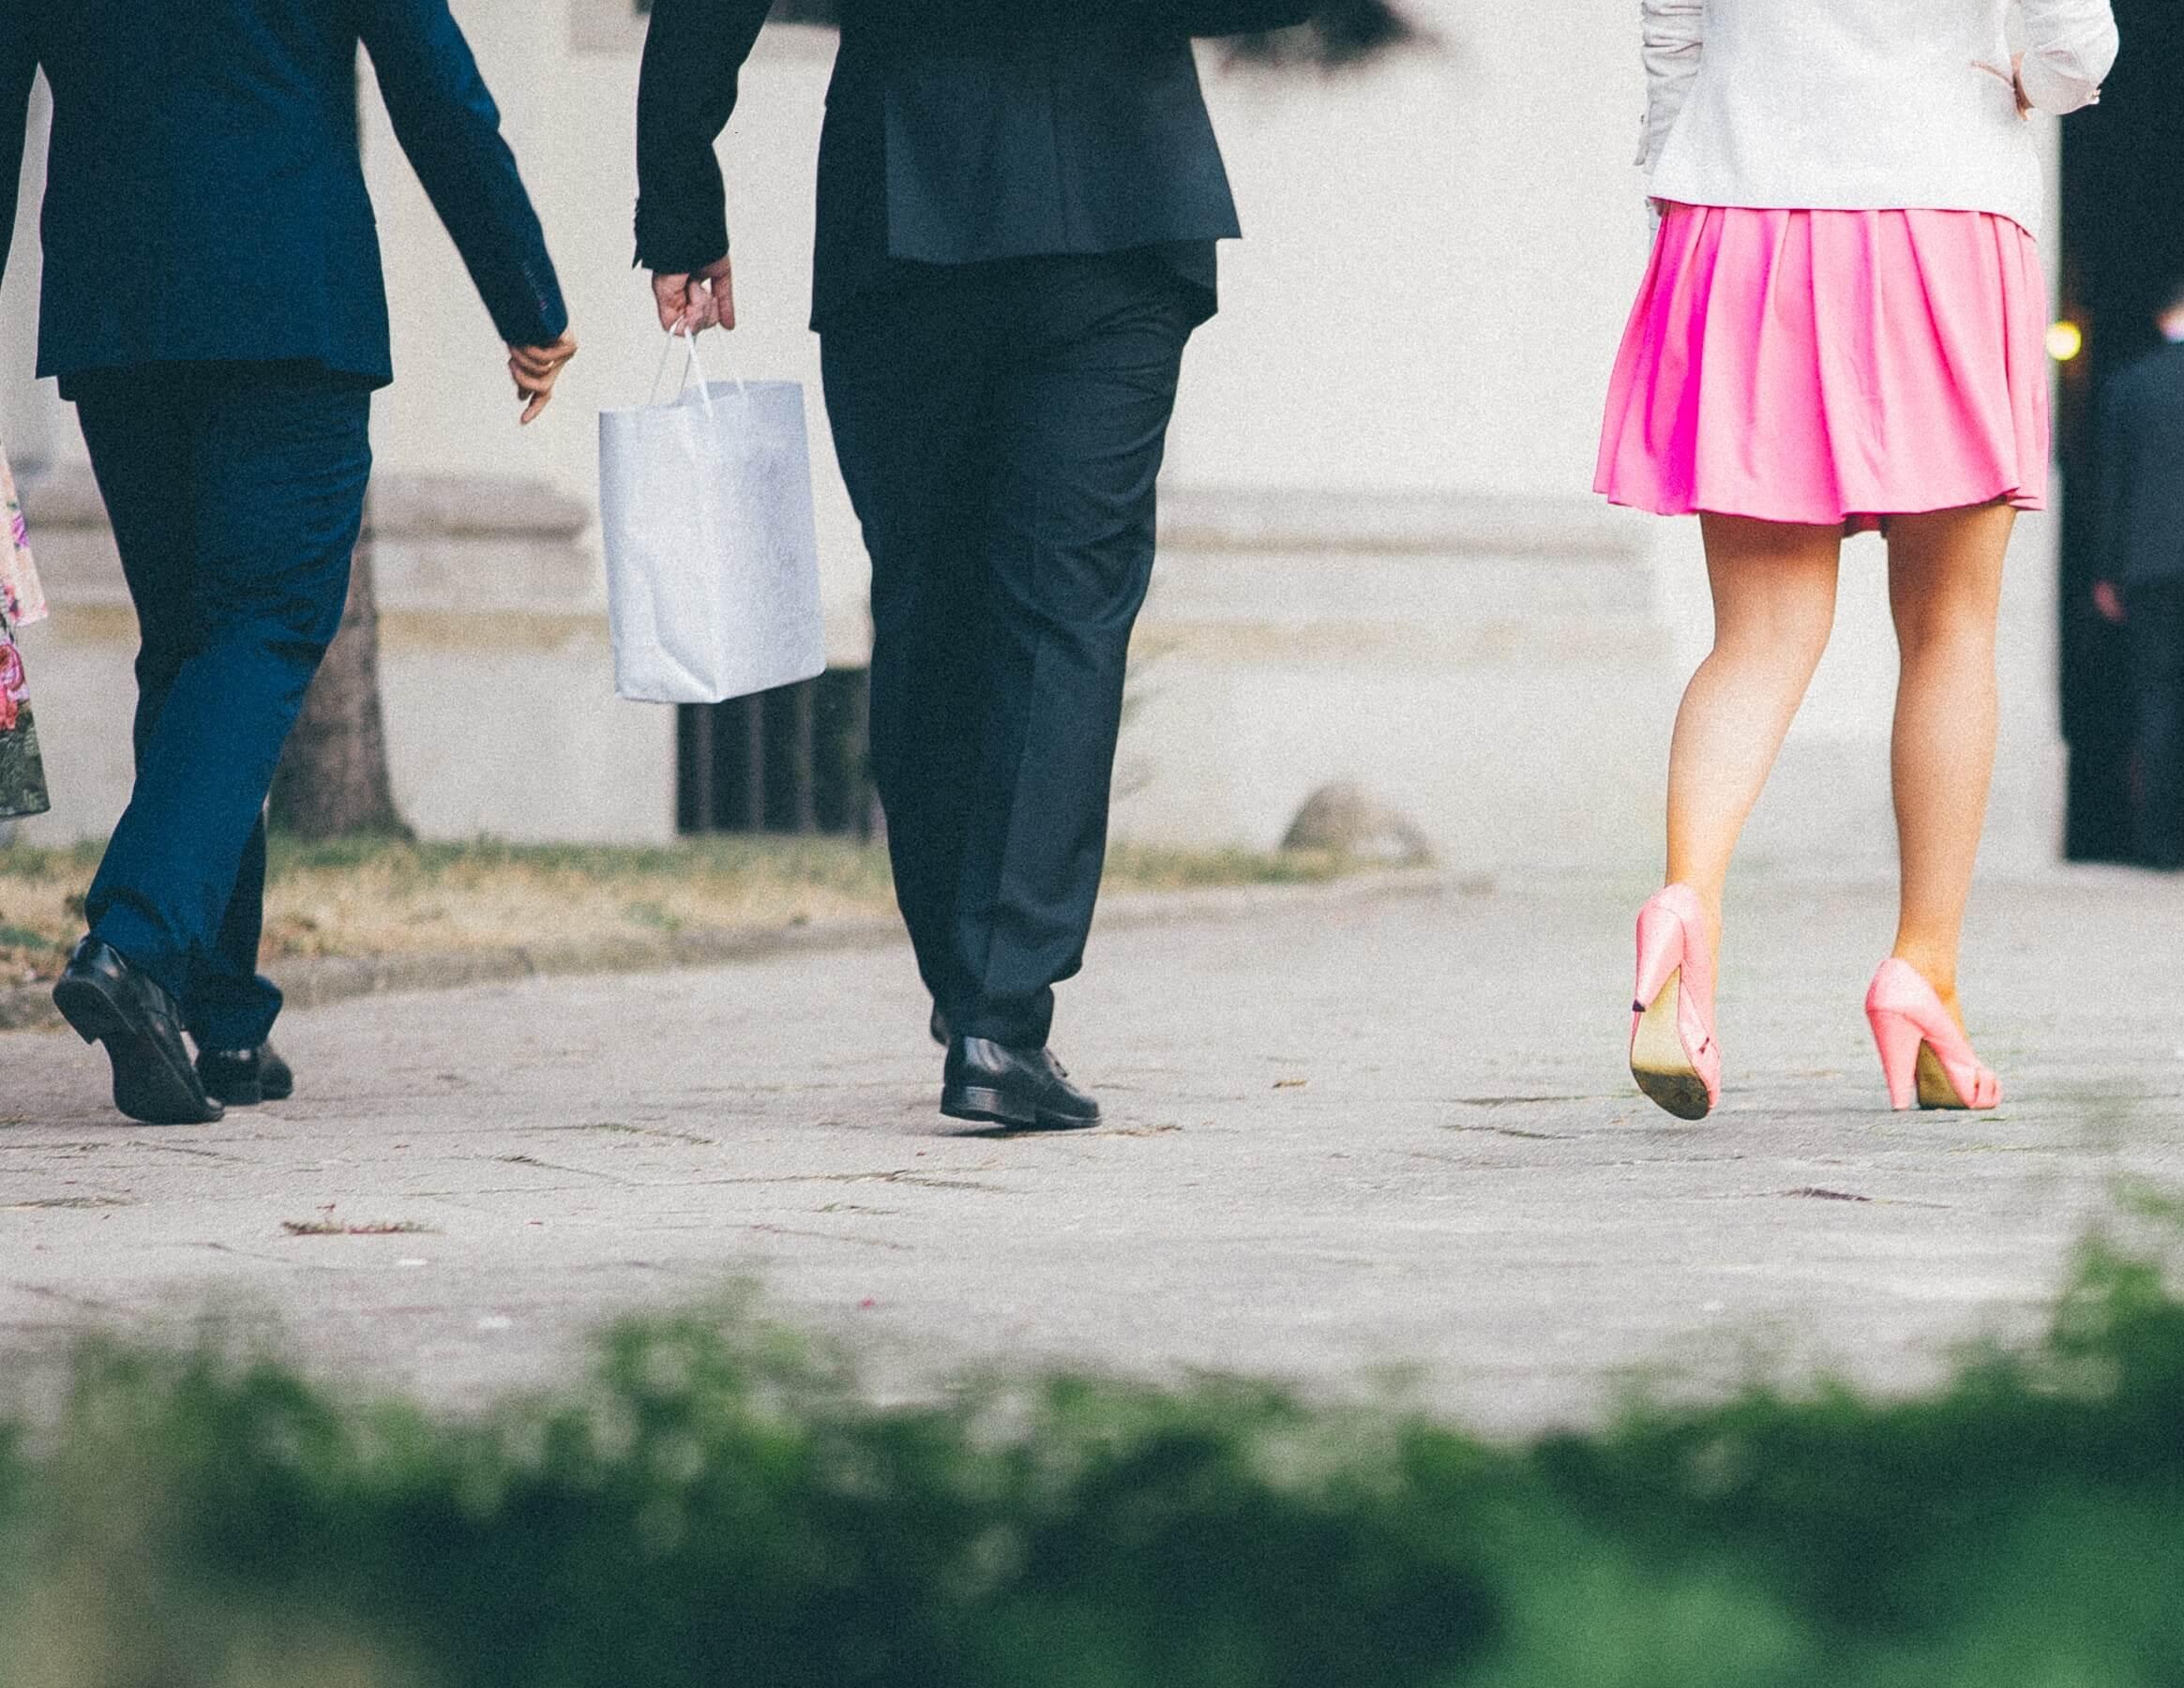 4 Ways To Make Workplace Fashion Super Comfortable